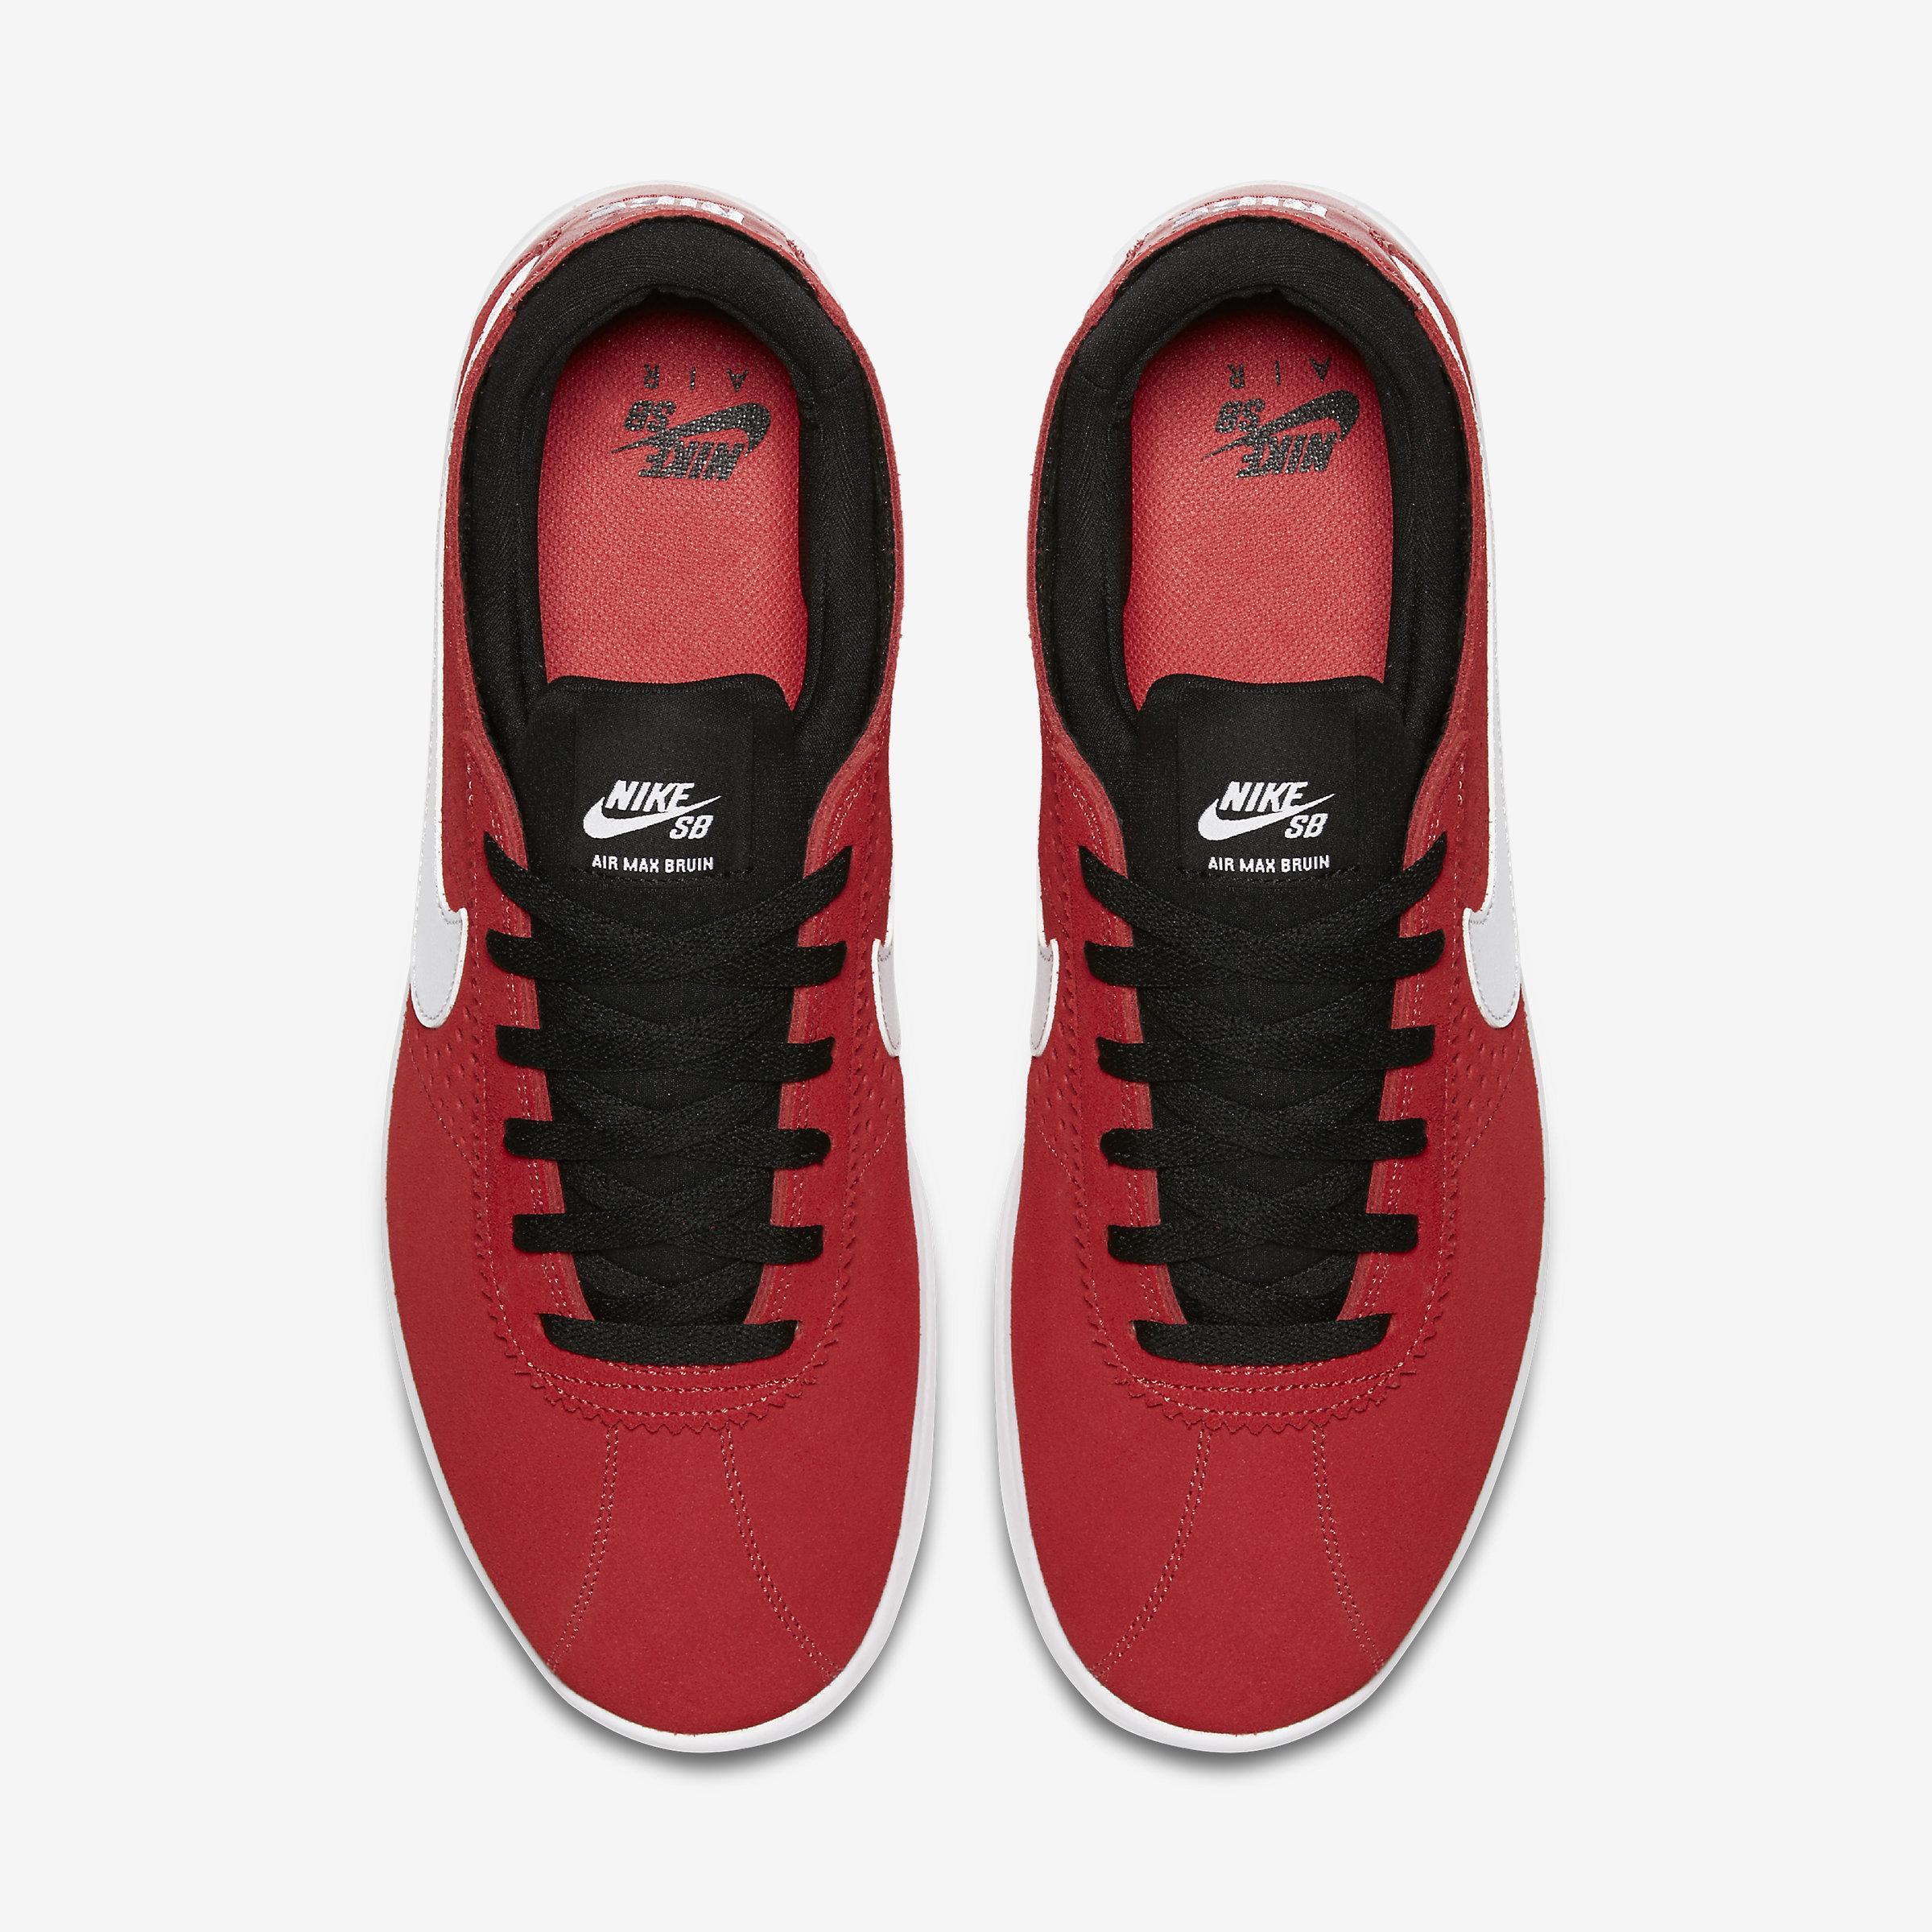 Nike Suede Sb Air Max Bruin Vapor in Red for Men